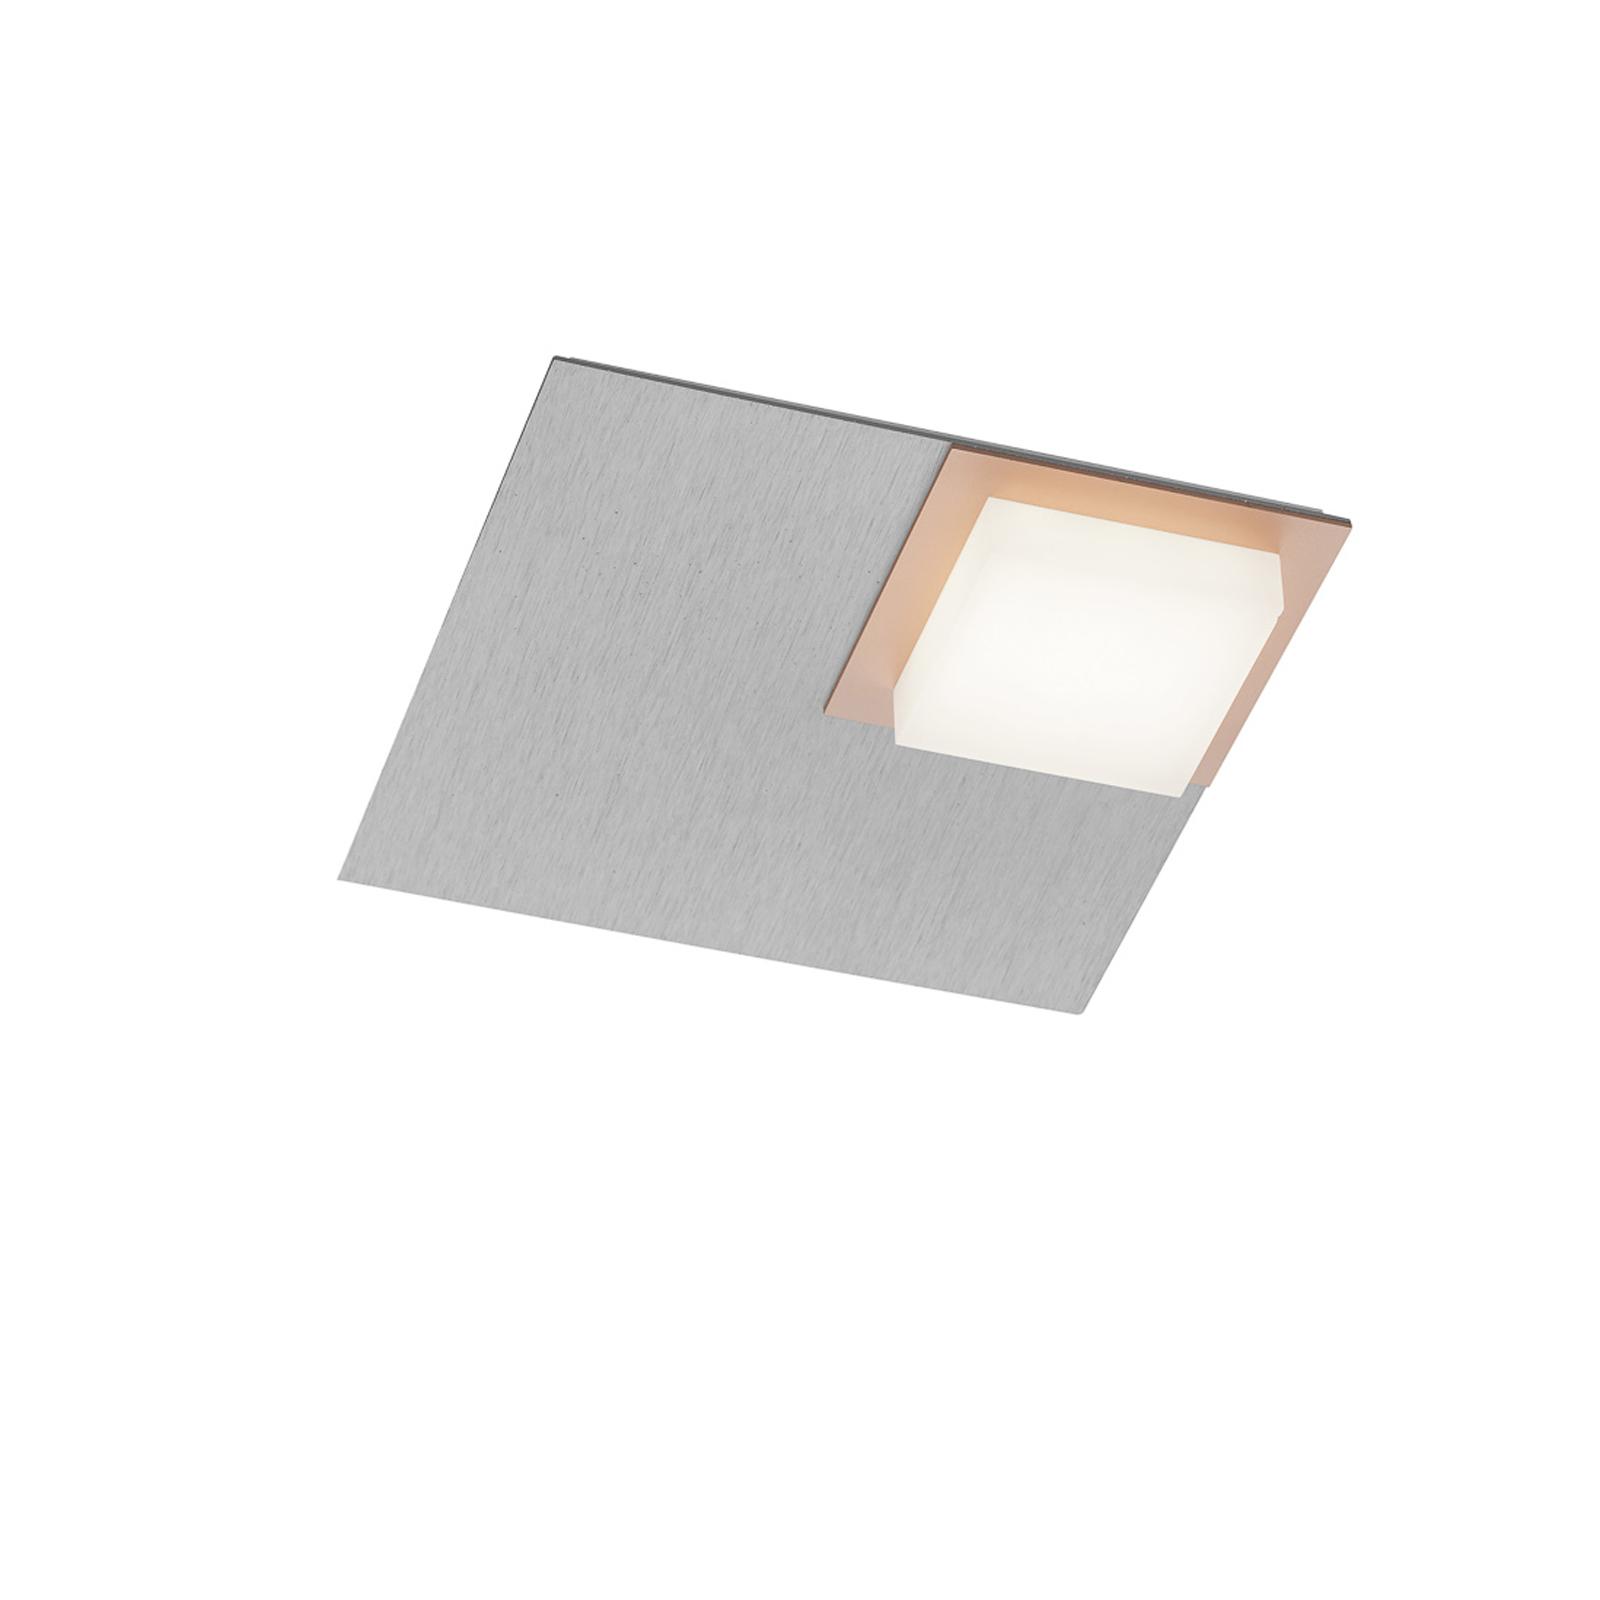 BANKAMP Quadro LED-taklampe 8W sølv